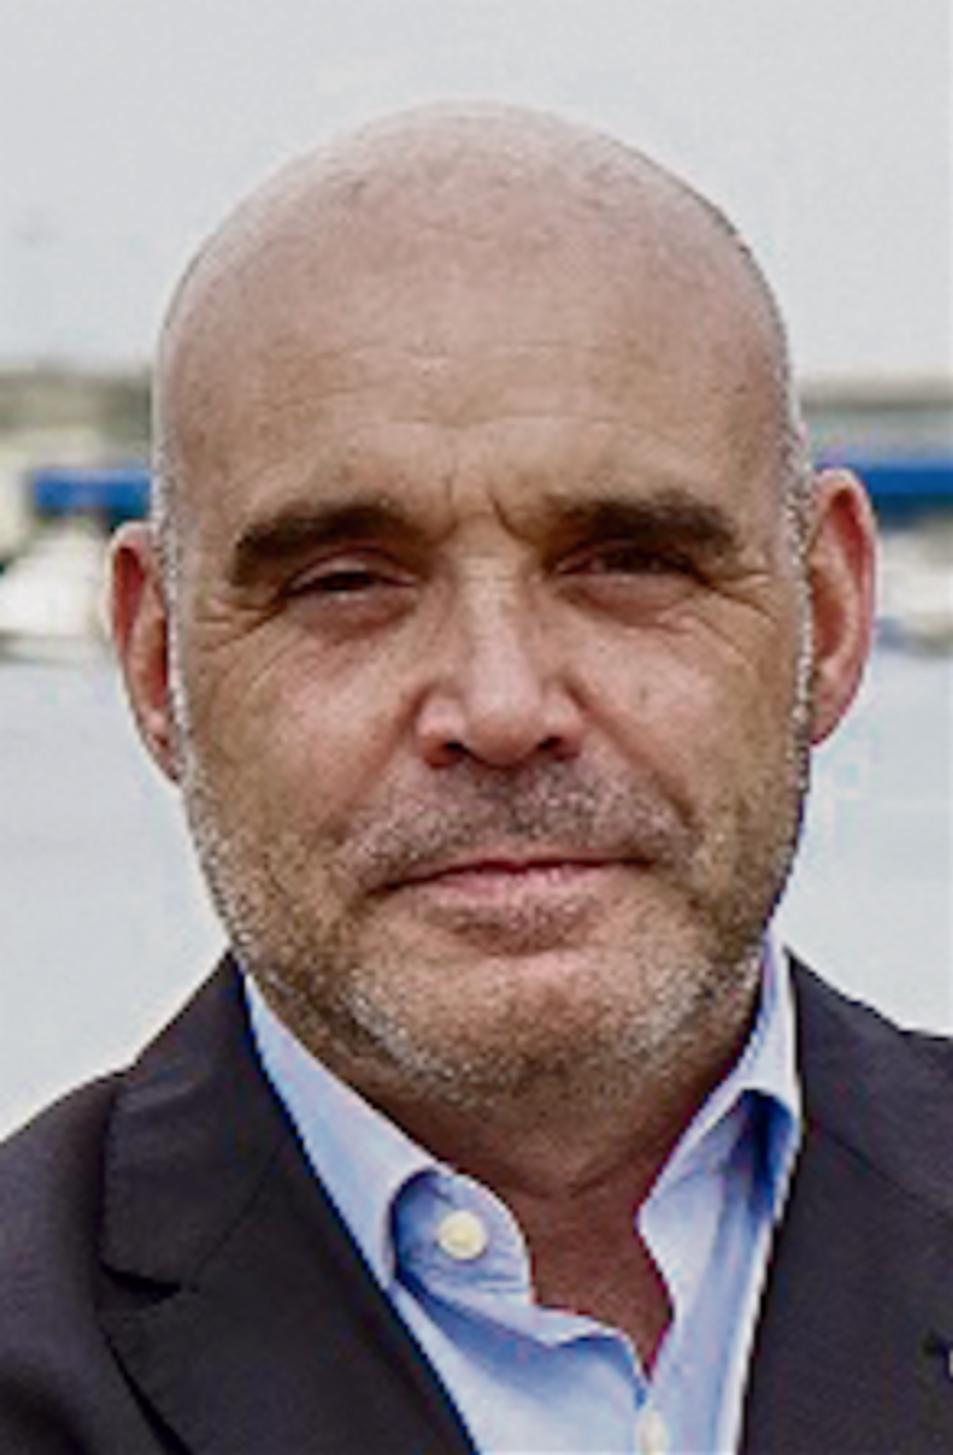 Daniel Cid